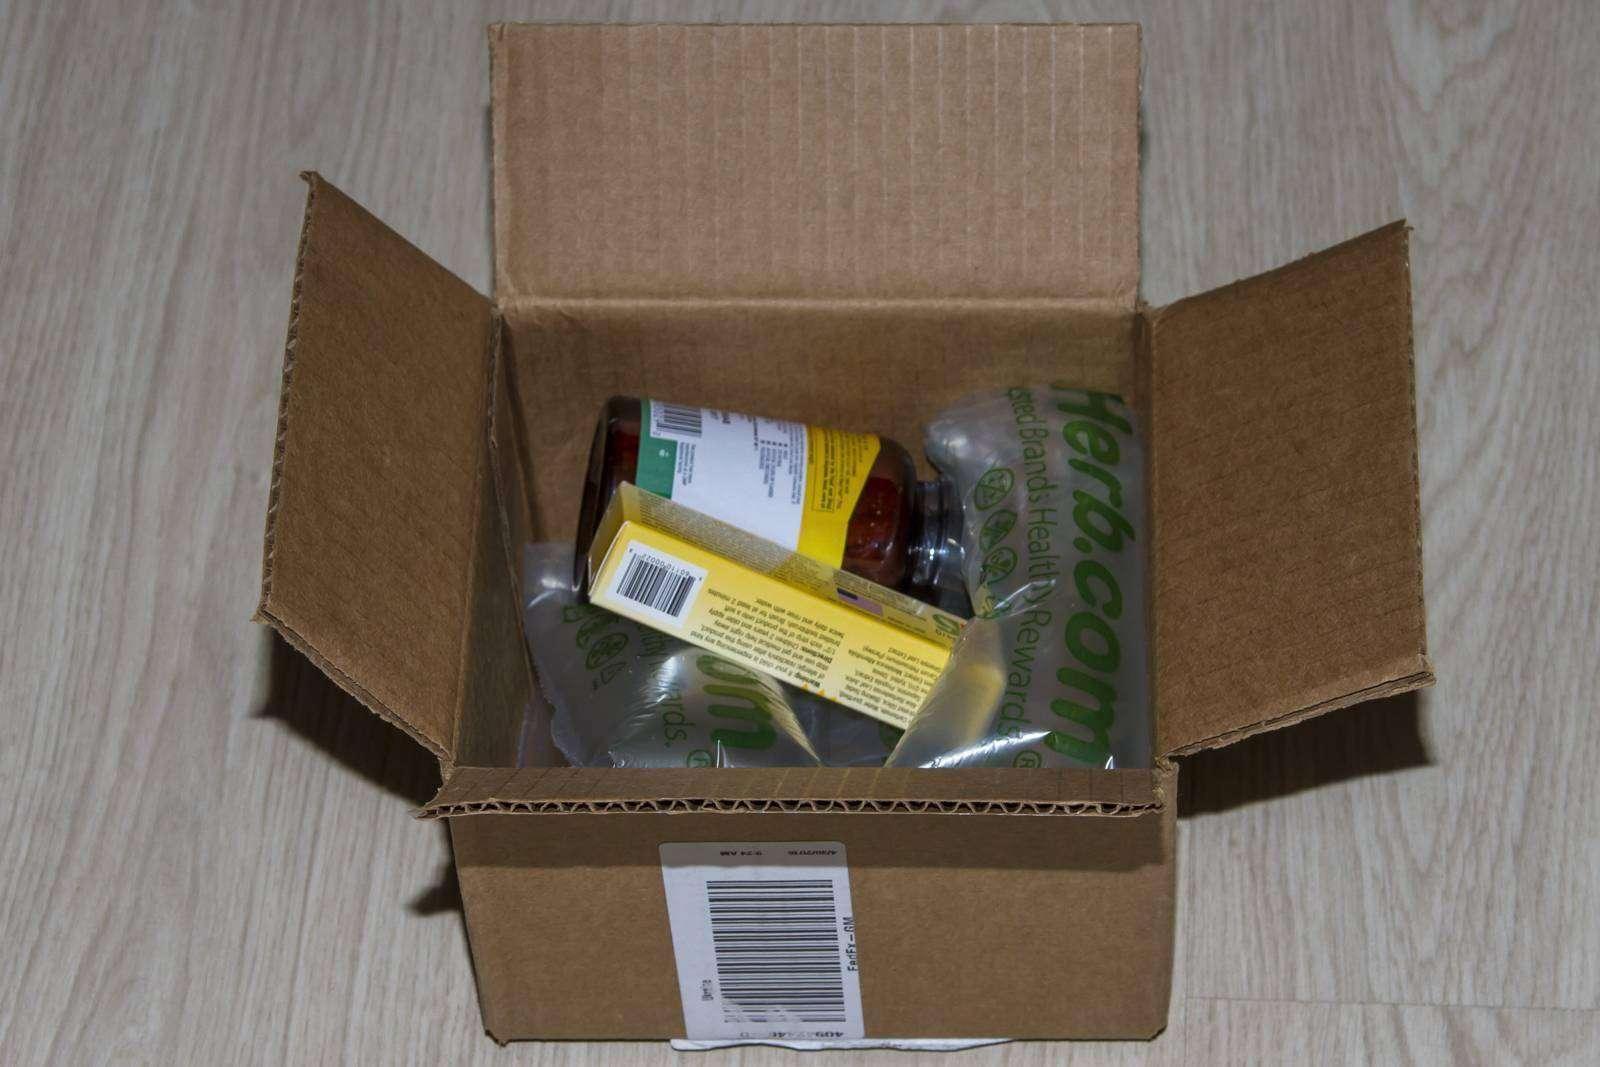 IHerb: Заказ с Iherb - Country Life, Maxi-Hair, 90 таблеток и детская зубная паста GreenPeach